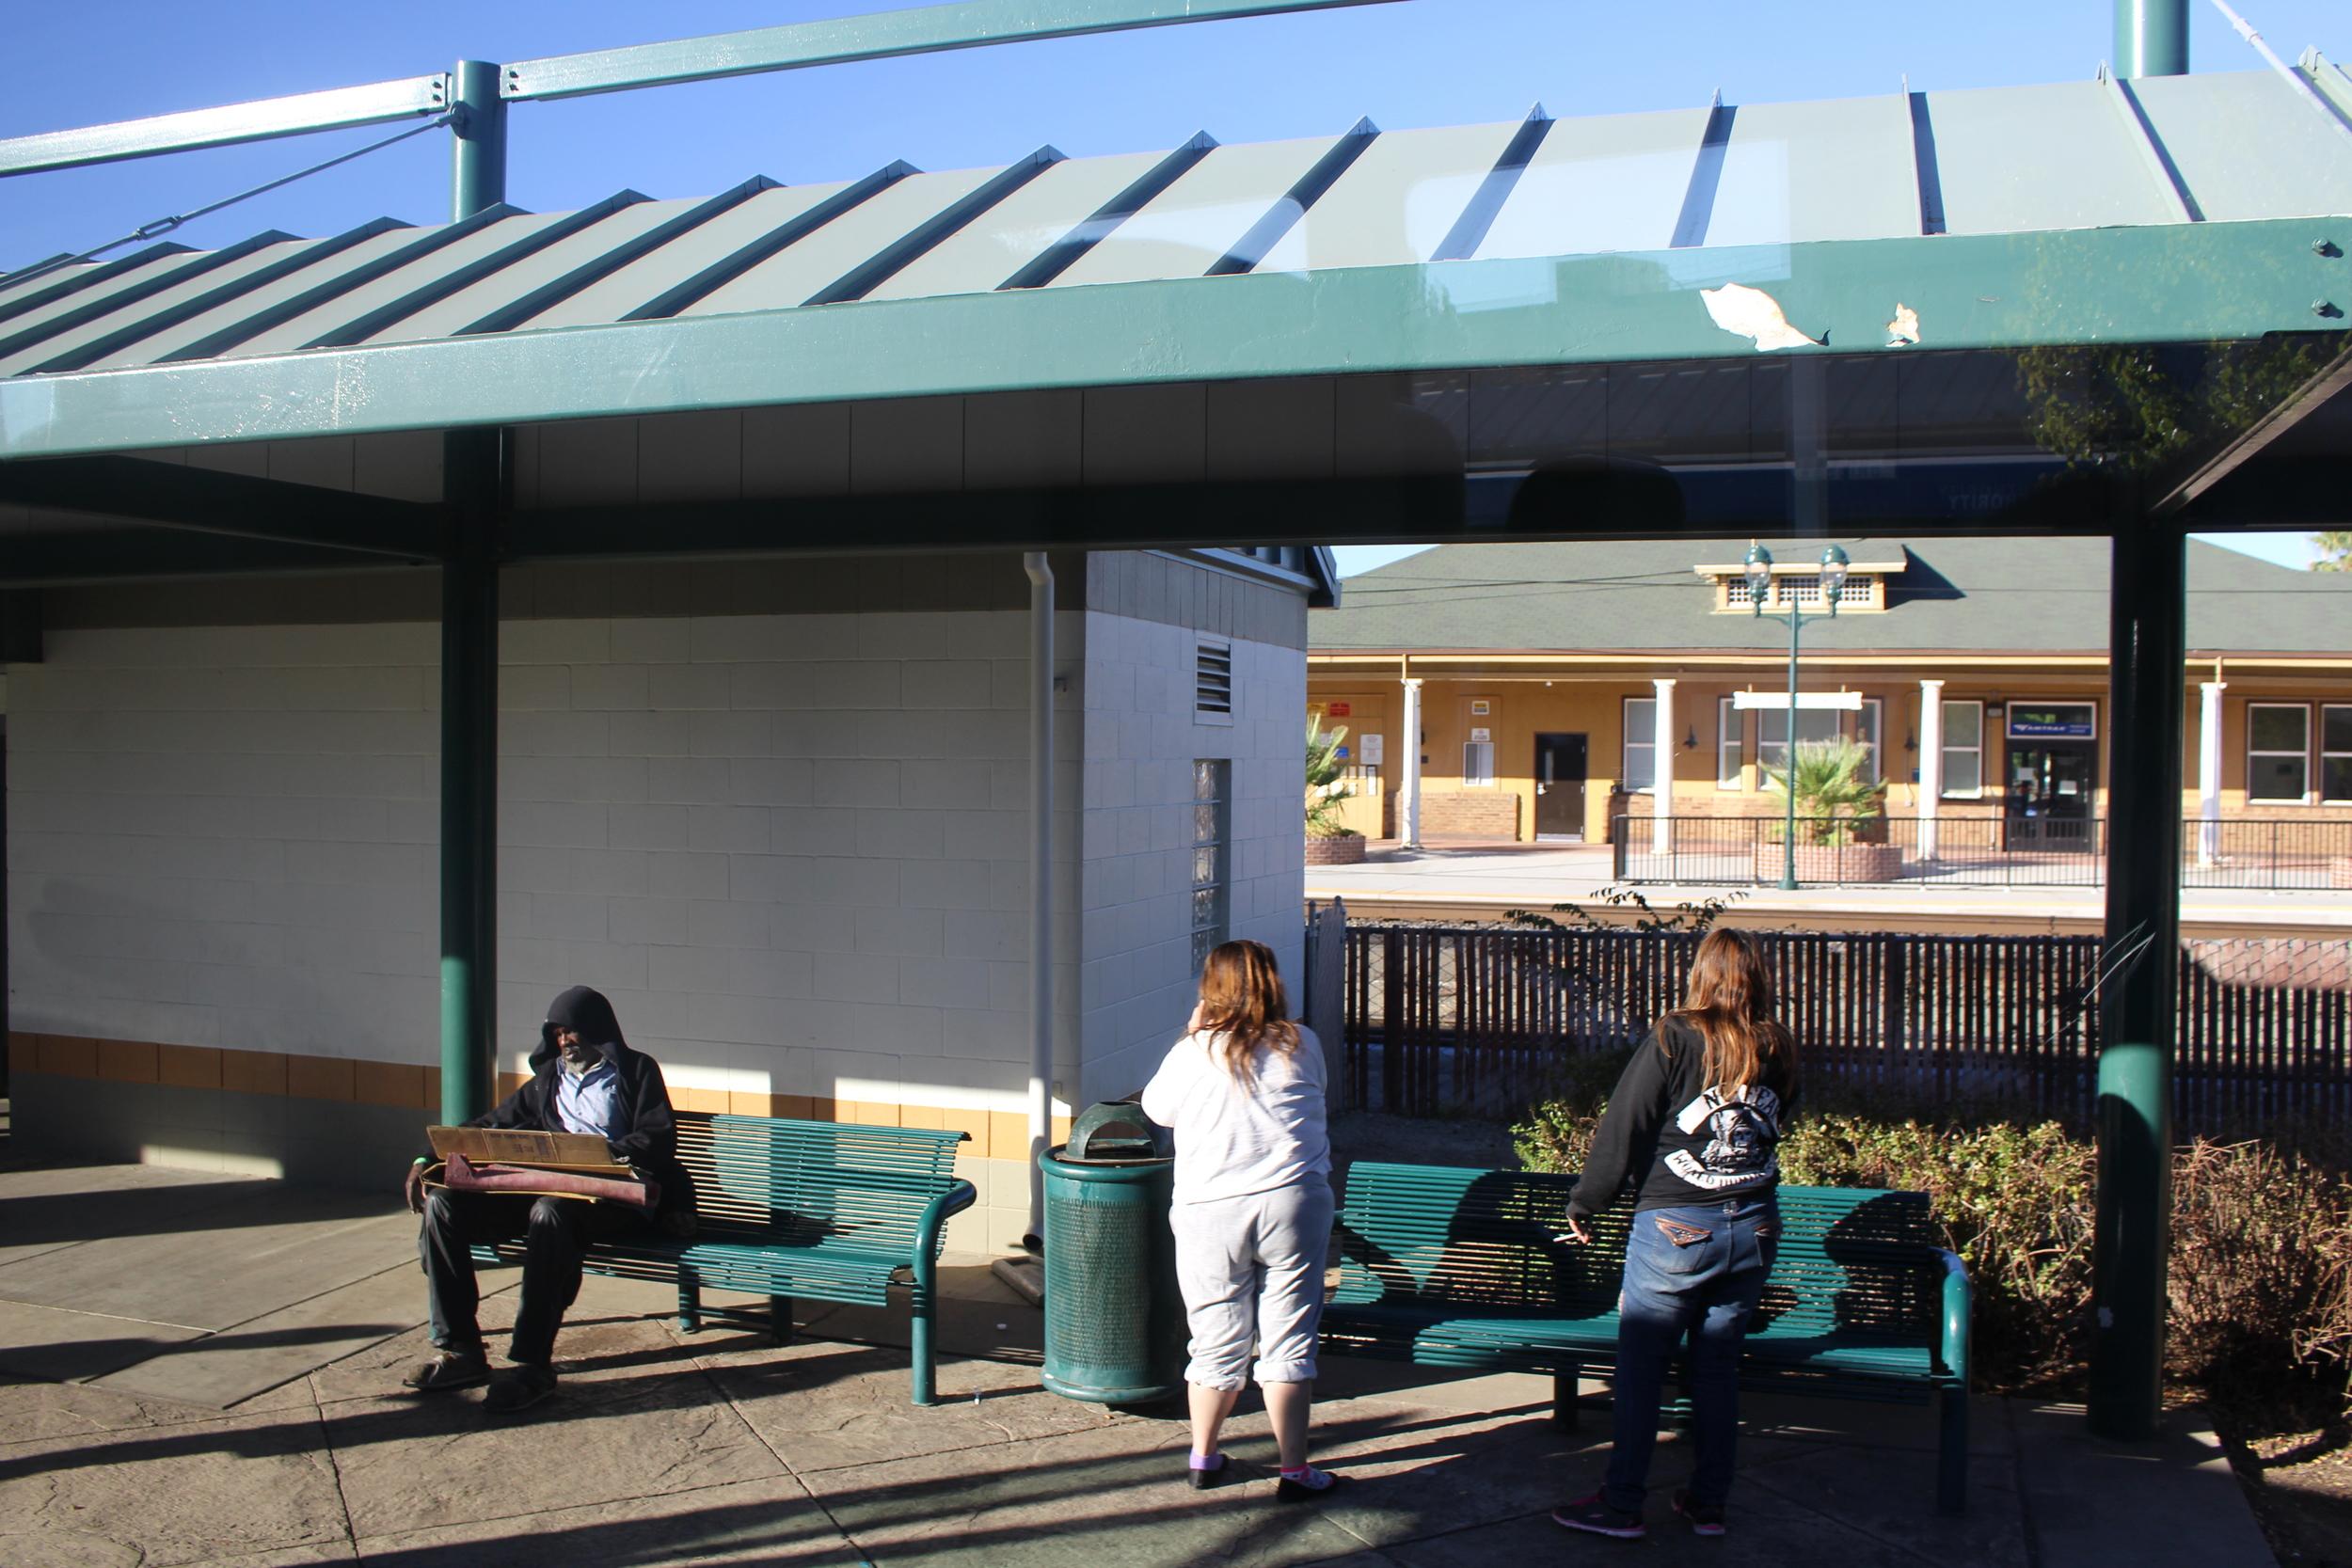 Station de Bus Greyhound quelque part en Caliofrnie